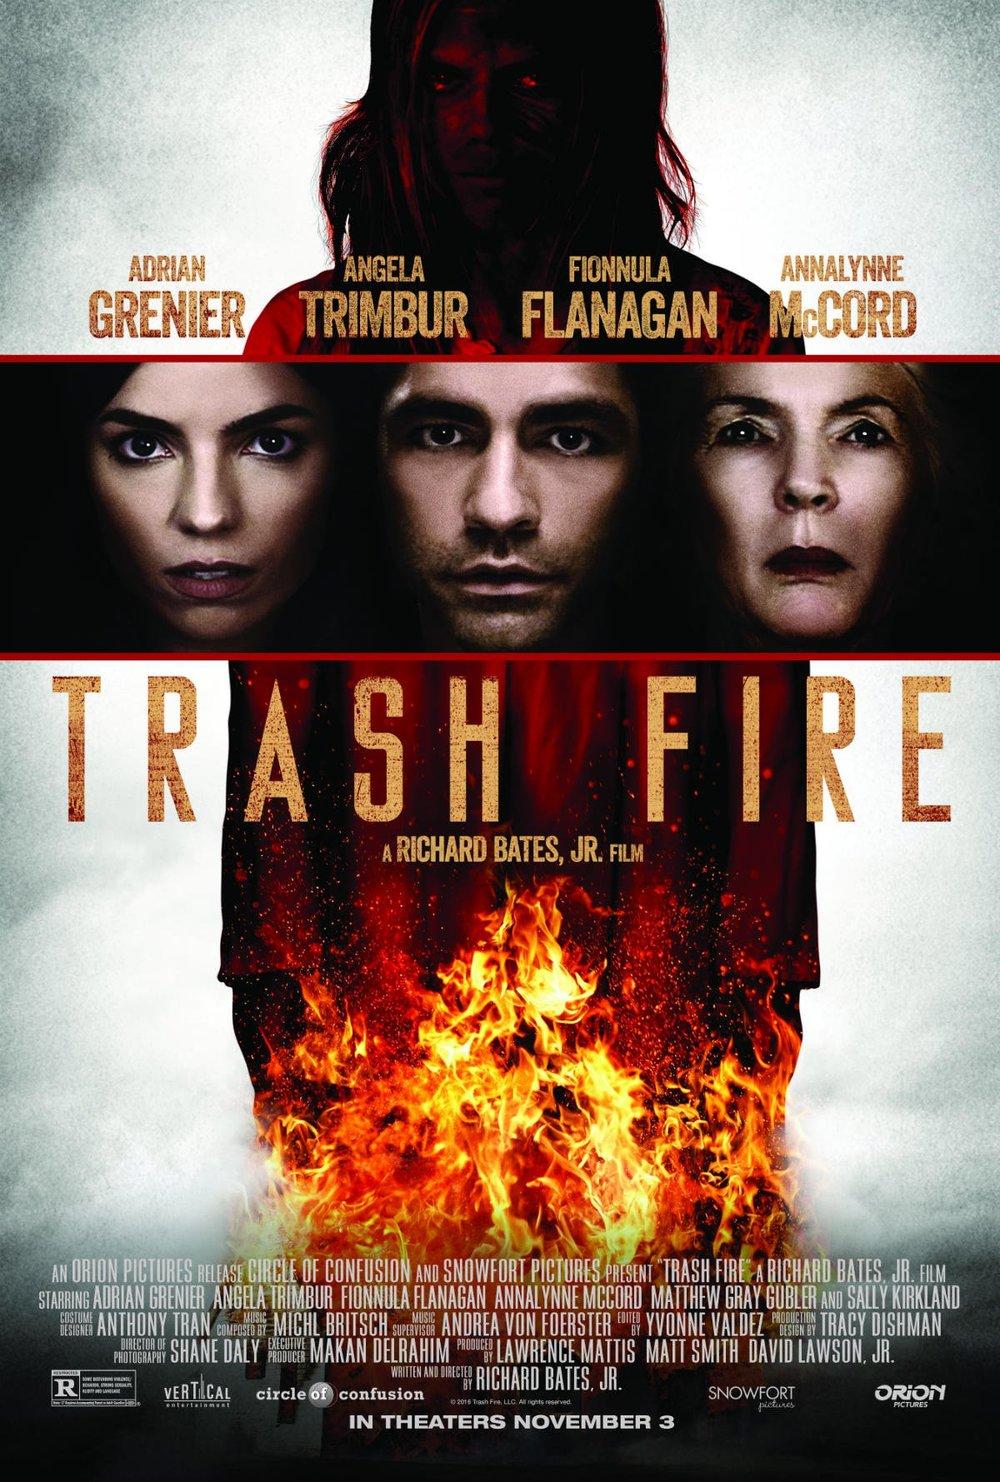 Trash-Fire-poster.jpg